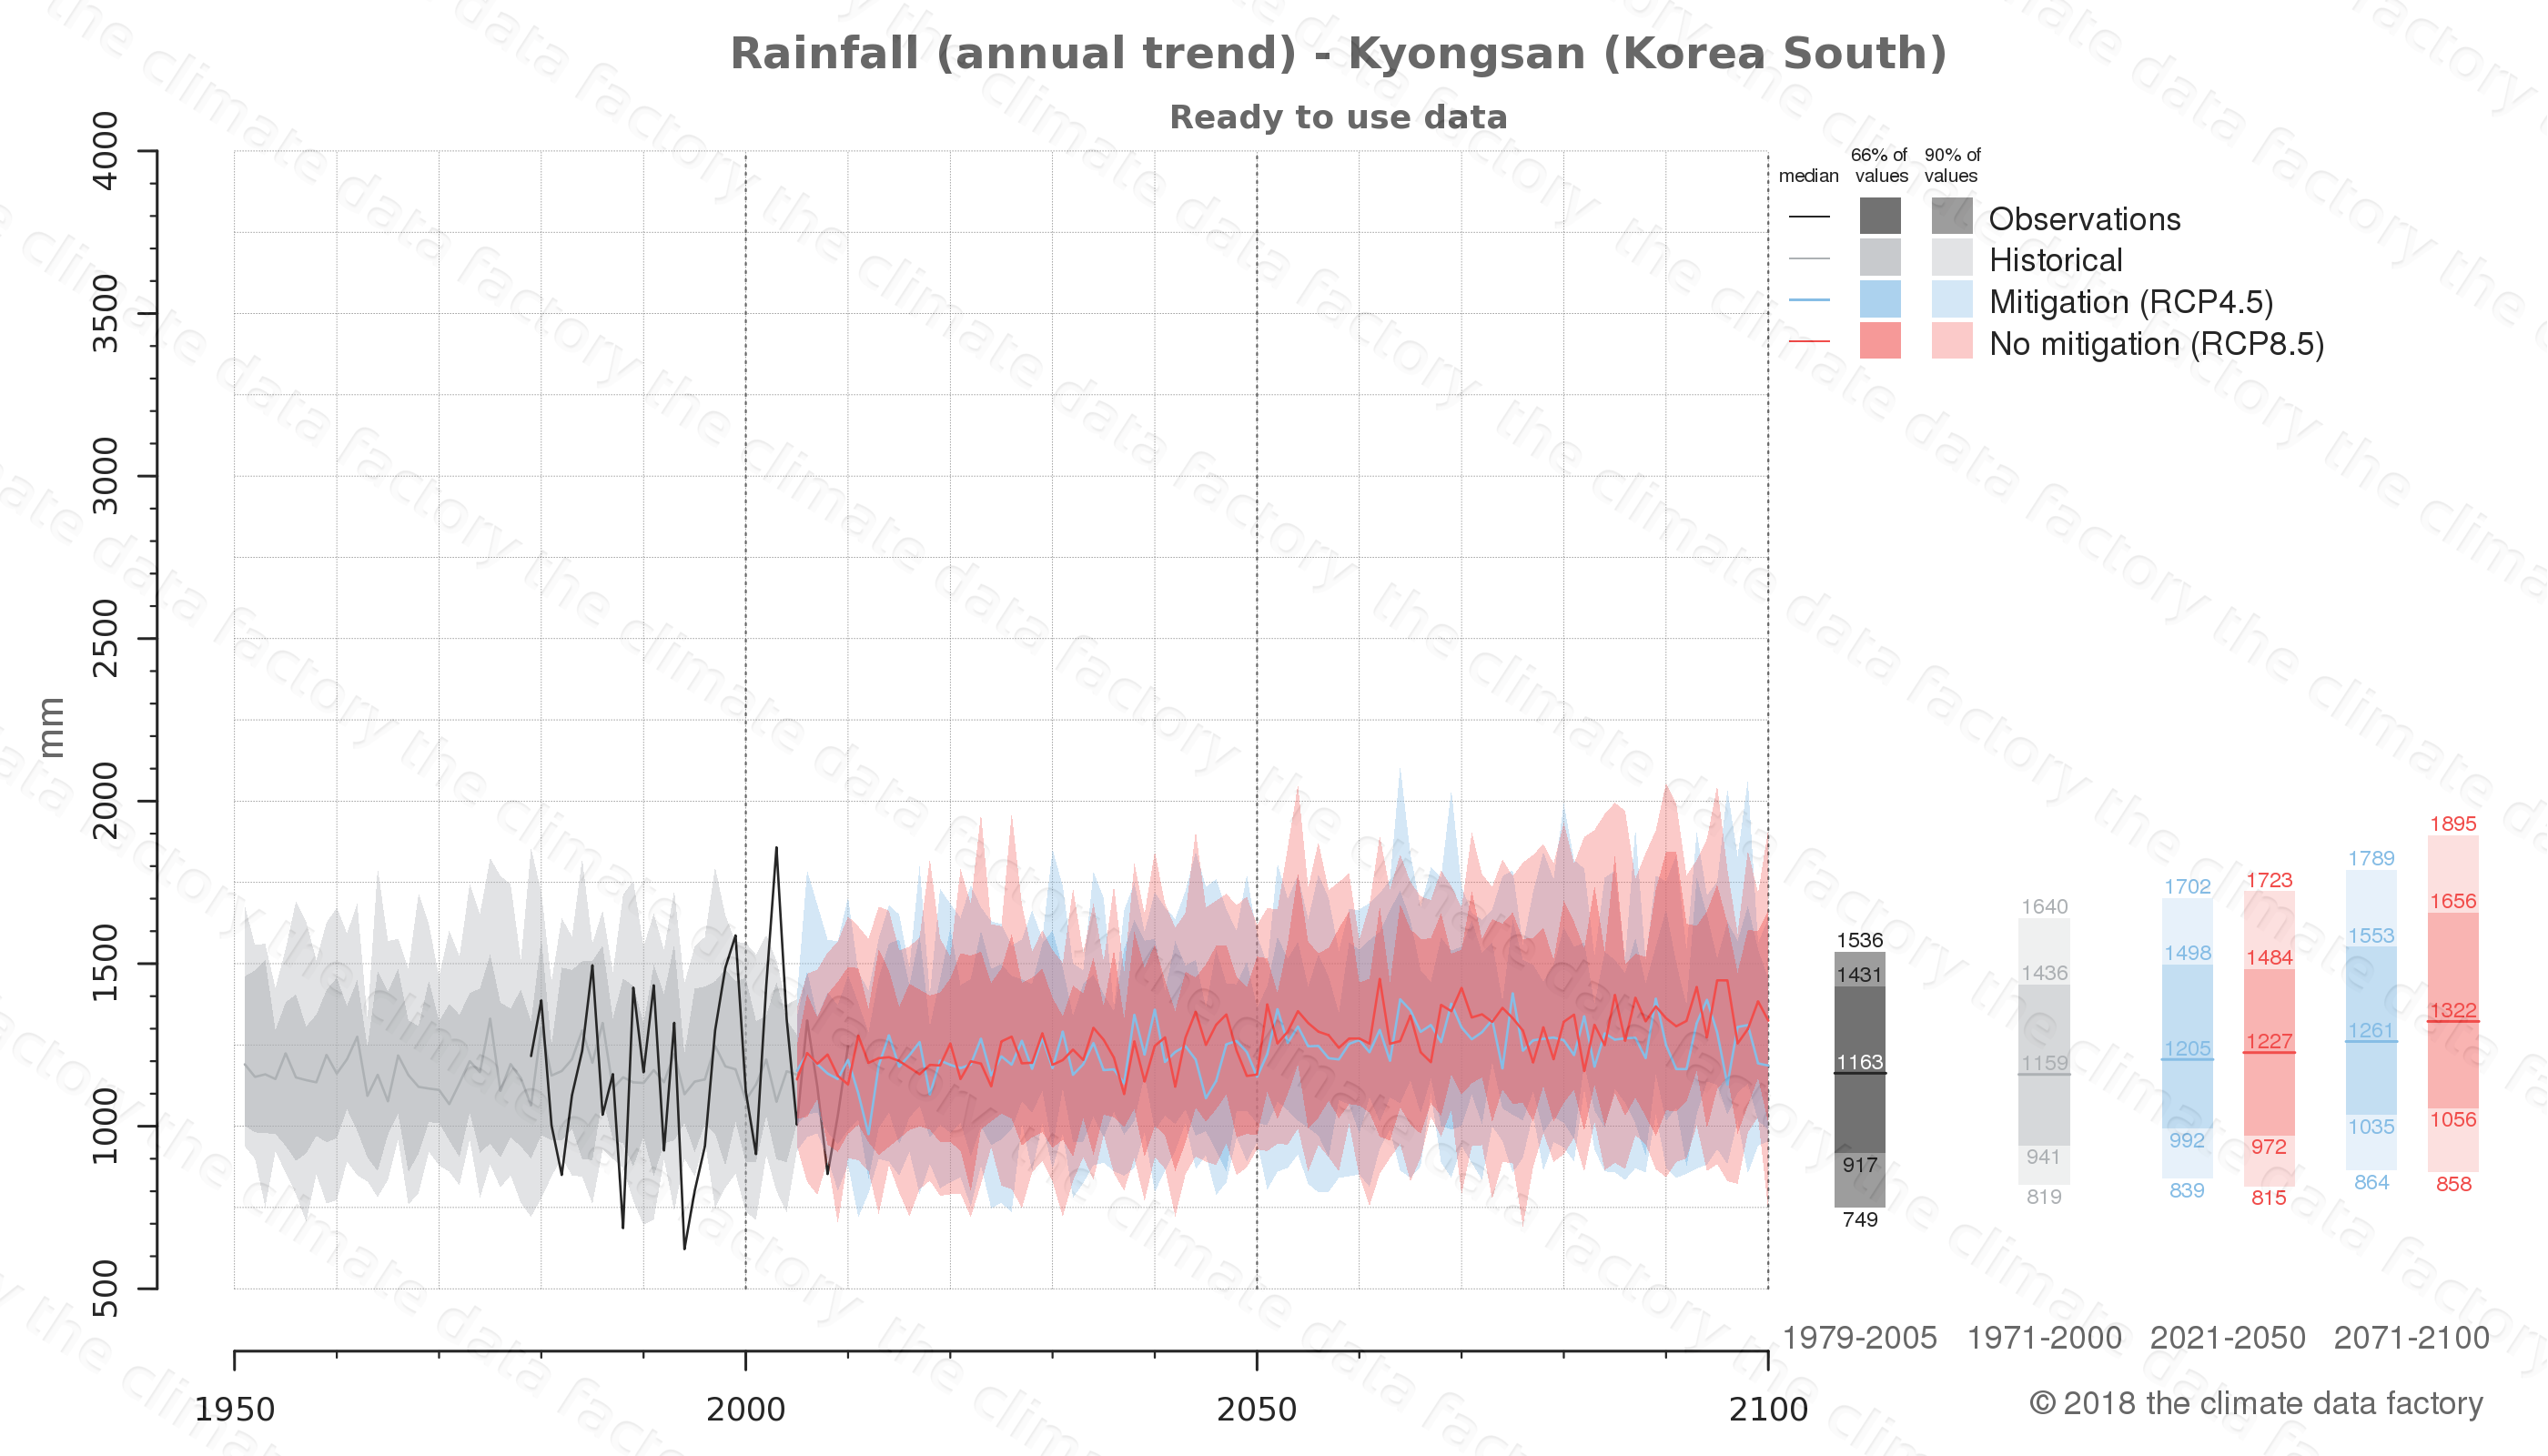 climate change data policy adaptation climate graph city data rainfall kyongsan south korea